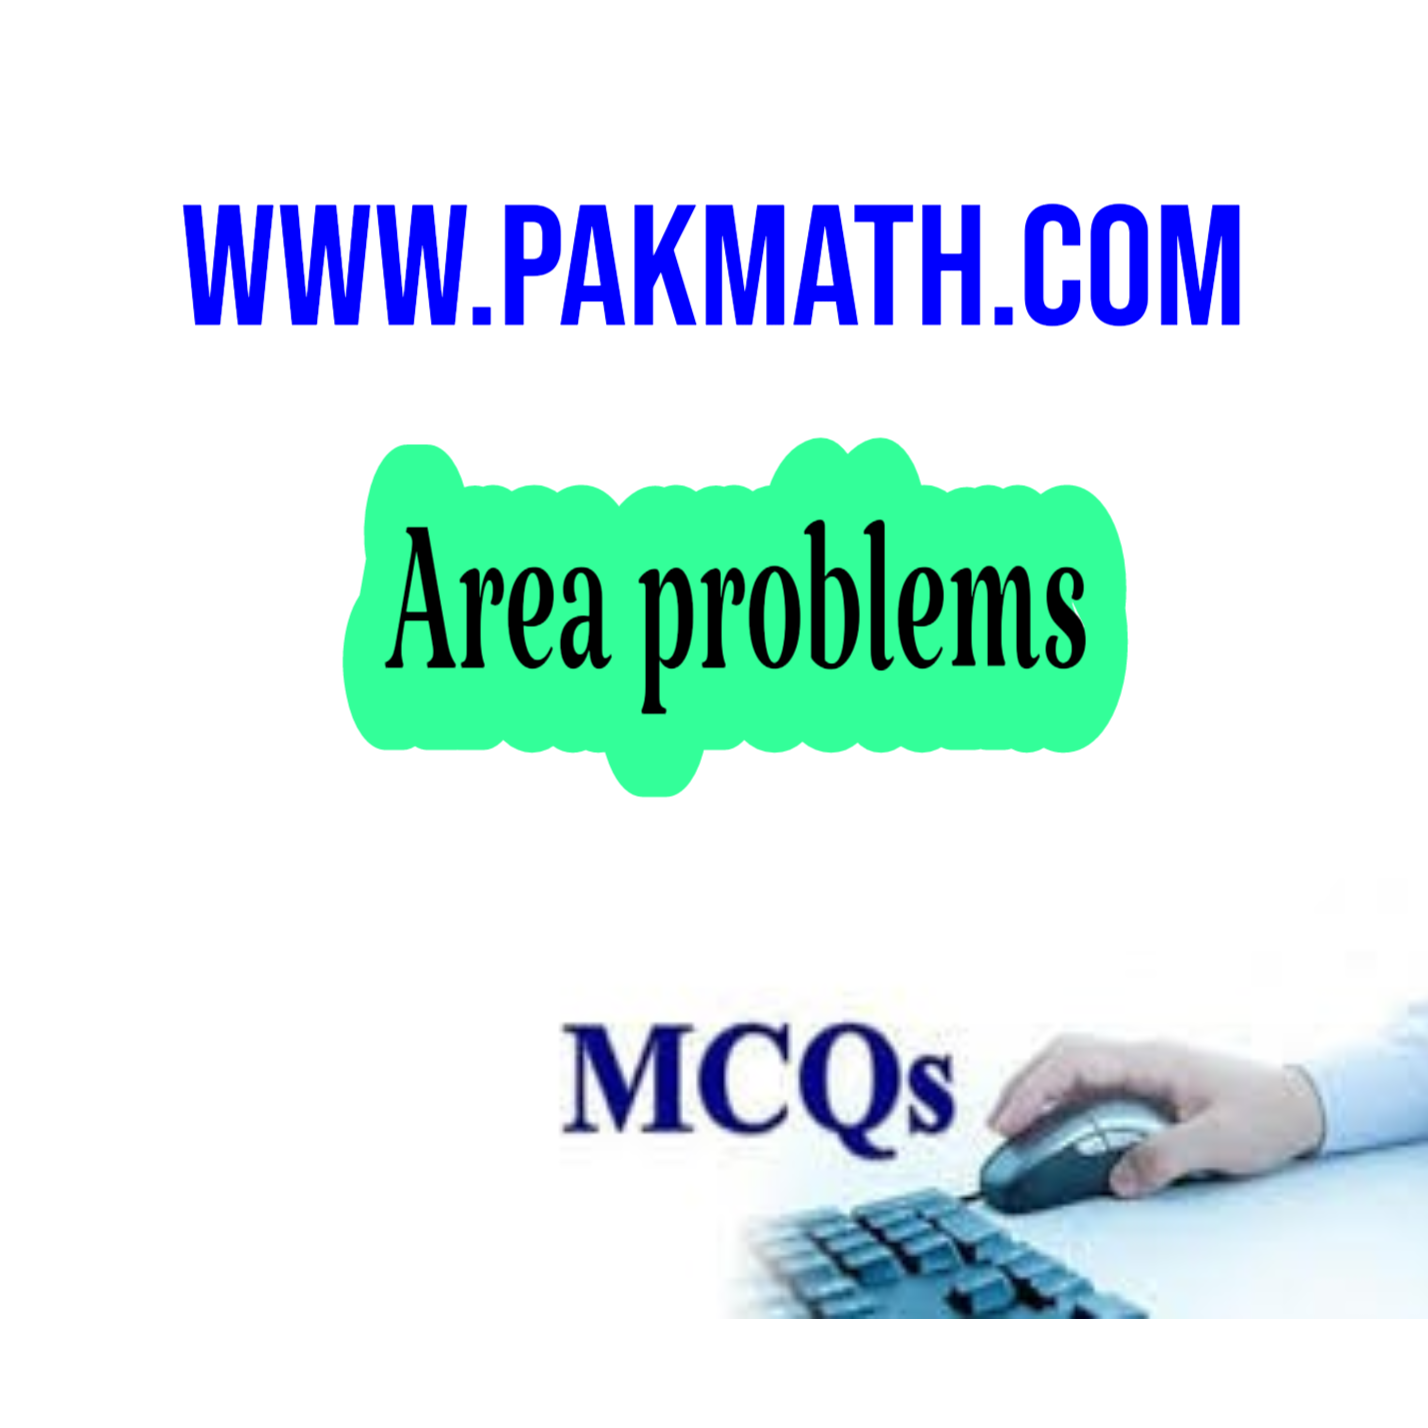 Area problems mcqs test 01